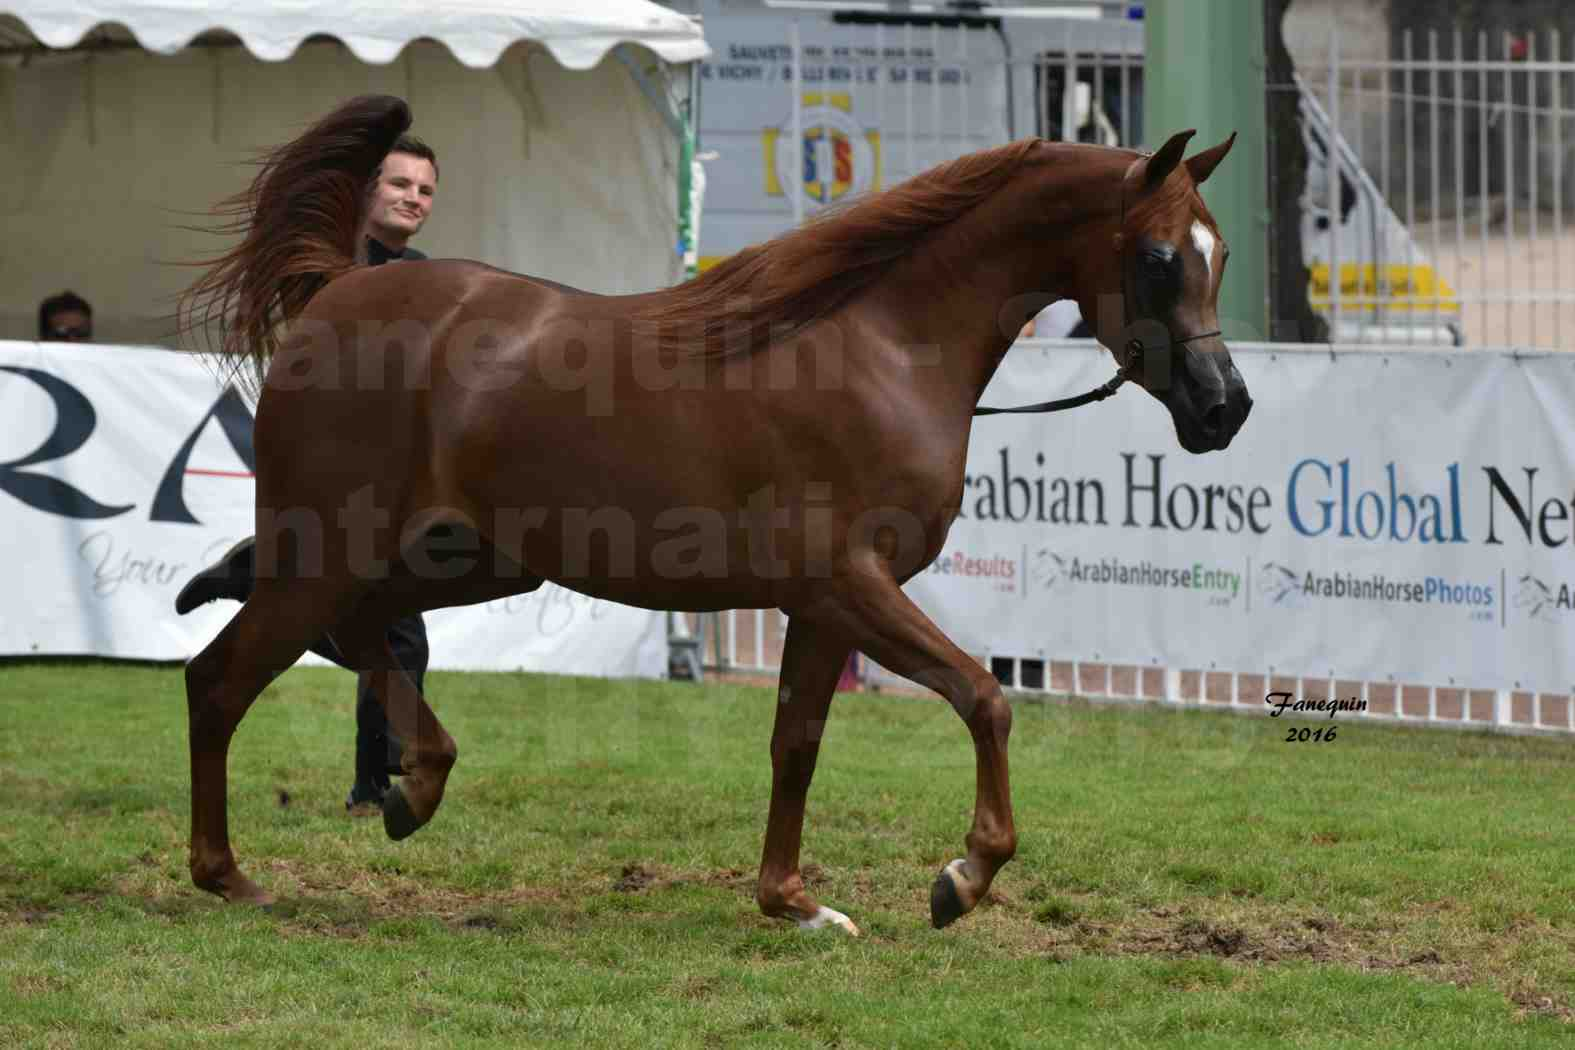 International Arabian Horse Show B de VICHY 2016 - PEARL DE DJOON - Notre Sélection - 25